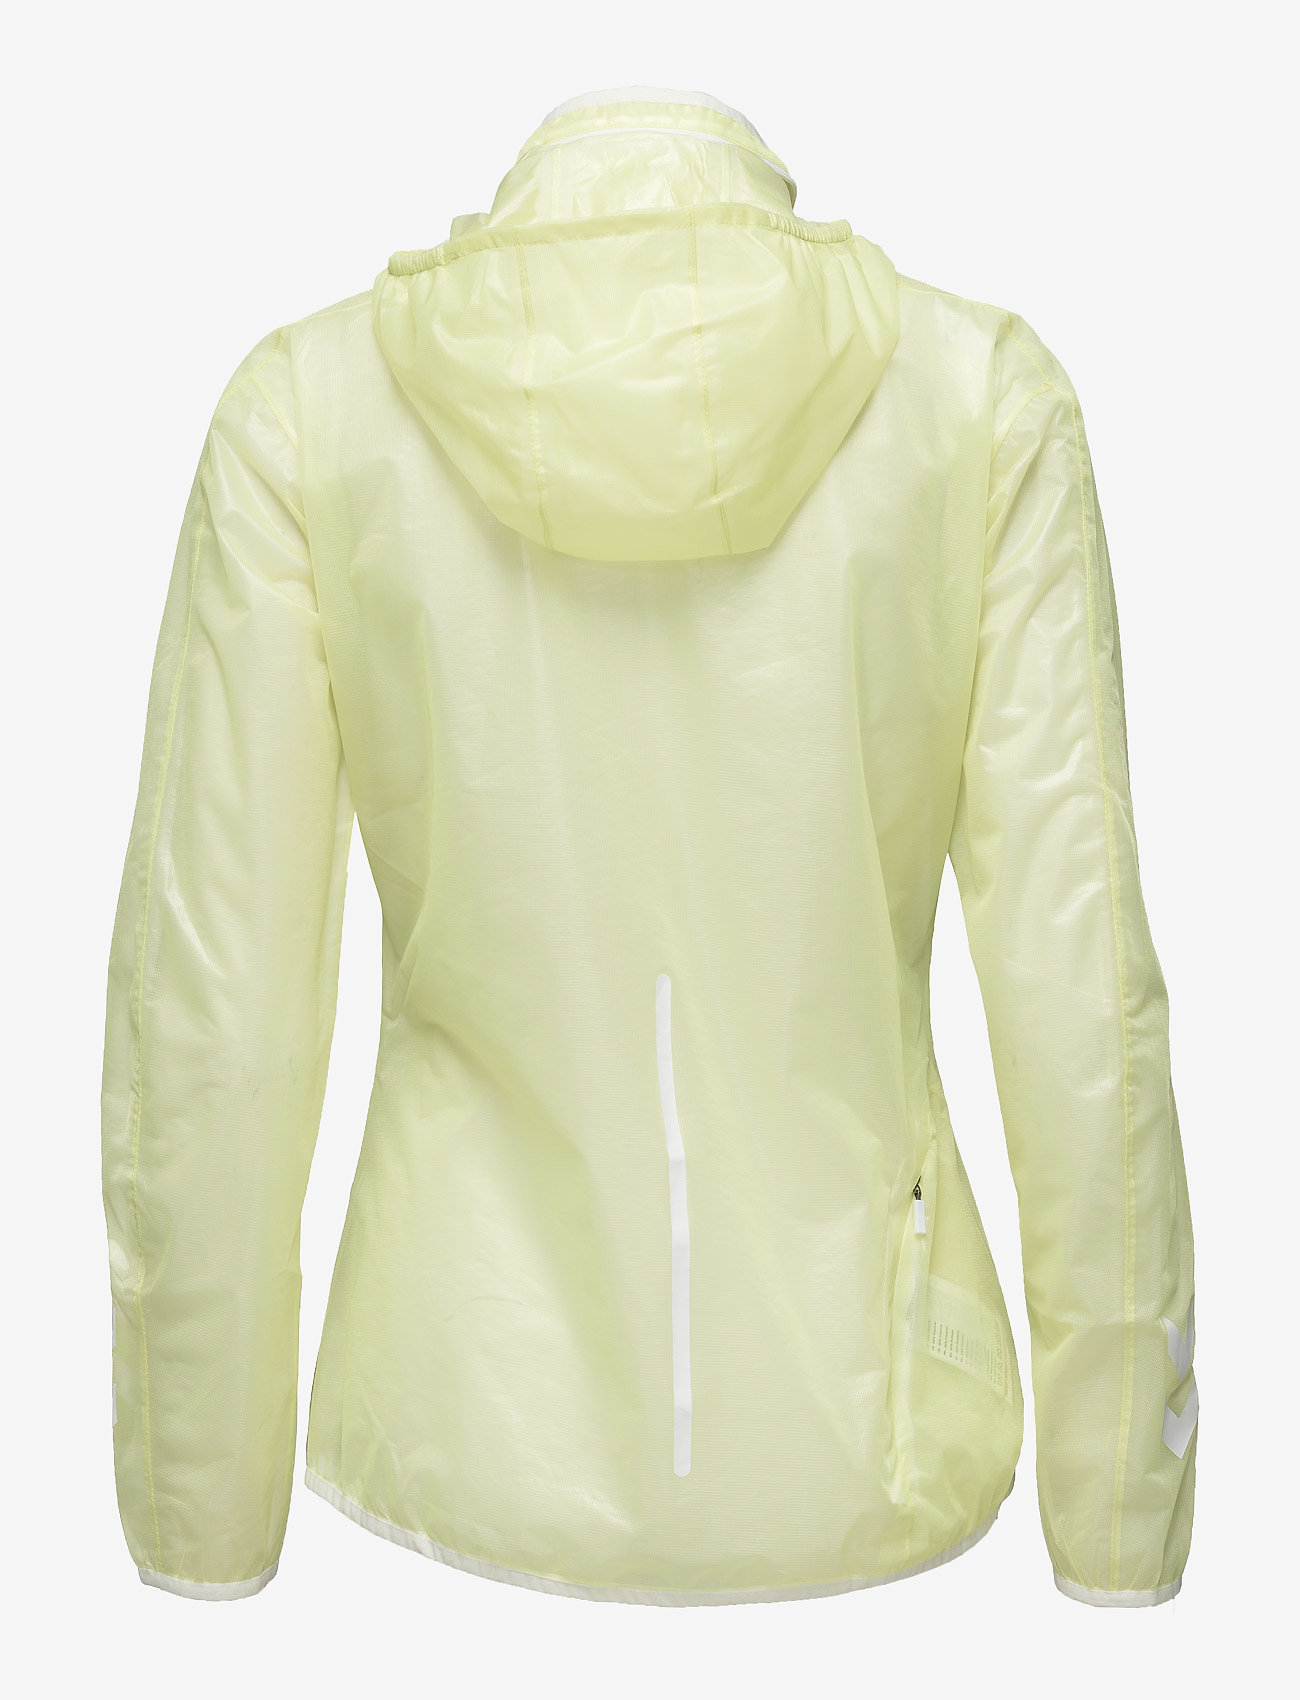 Särskild rabattAlessa Zip Jacket Sunny Lime 264 Hummel lMsyW Q31IM